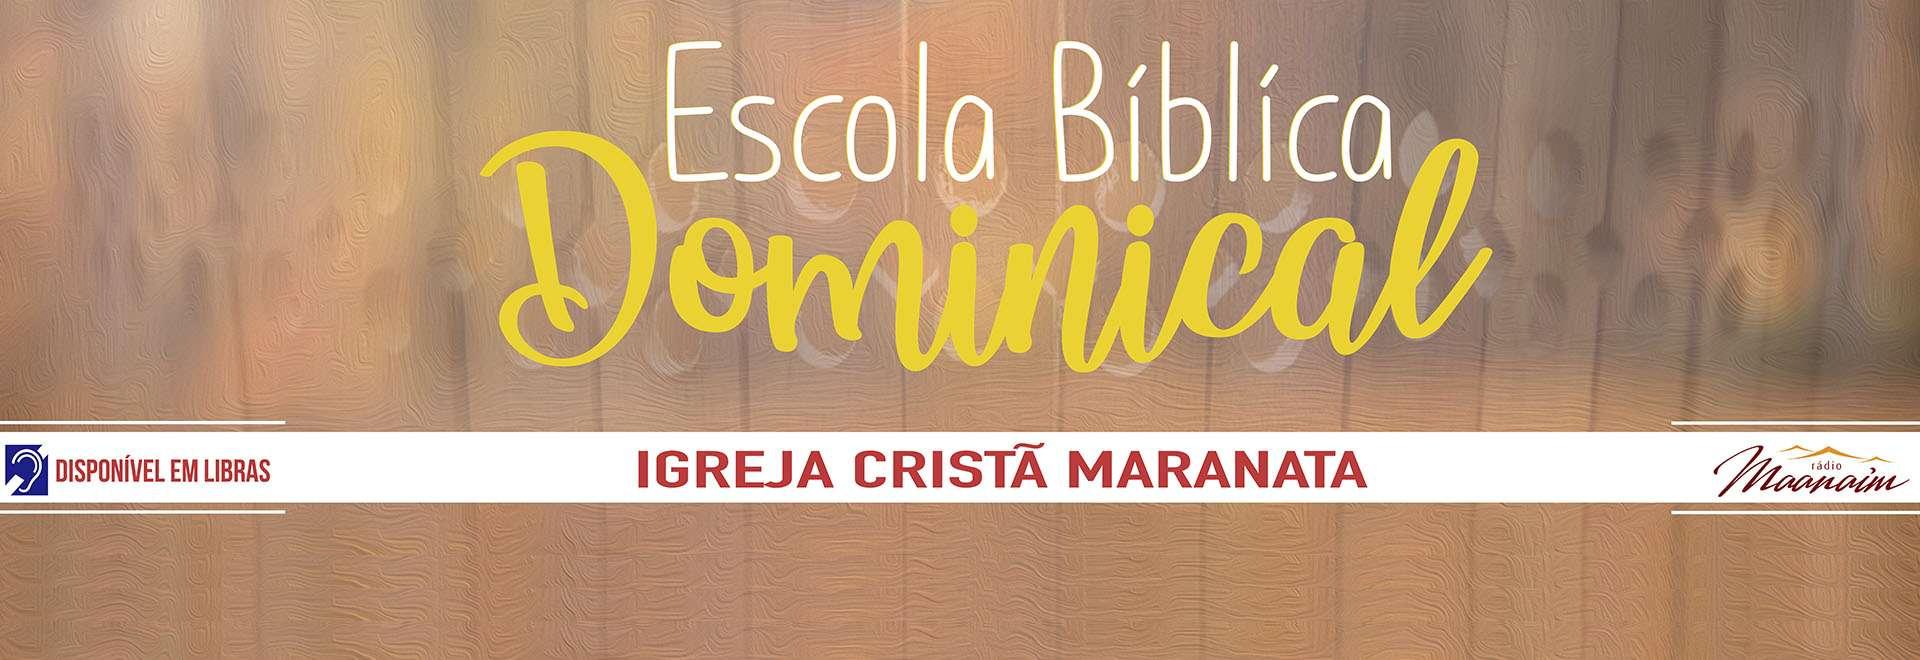 Participações da EBD da Igreja Cristã Maranata - 31/01/2021